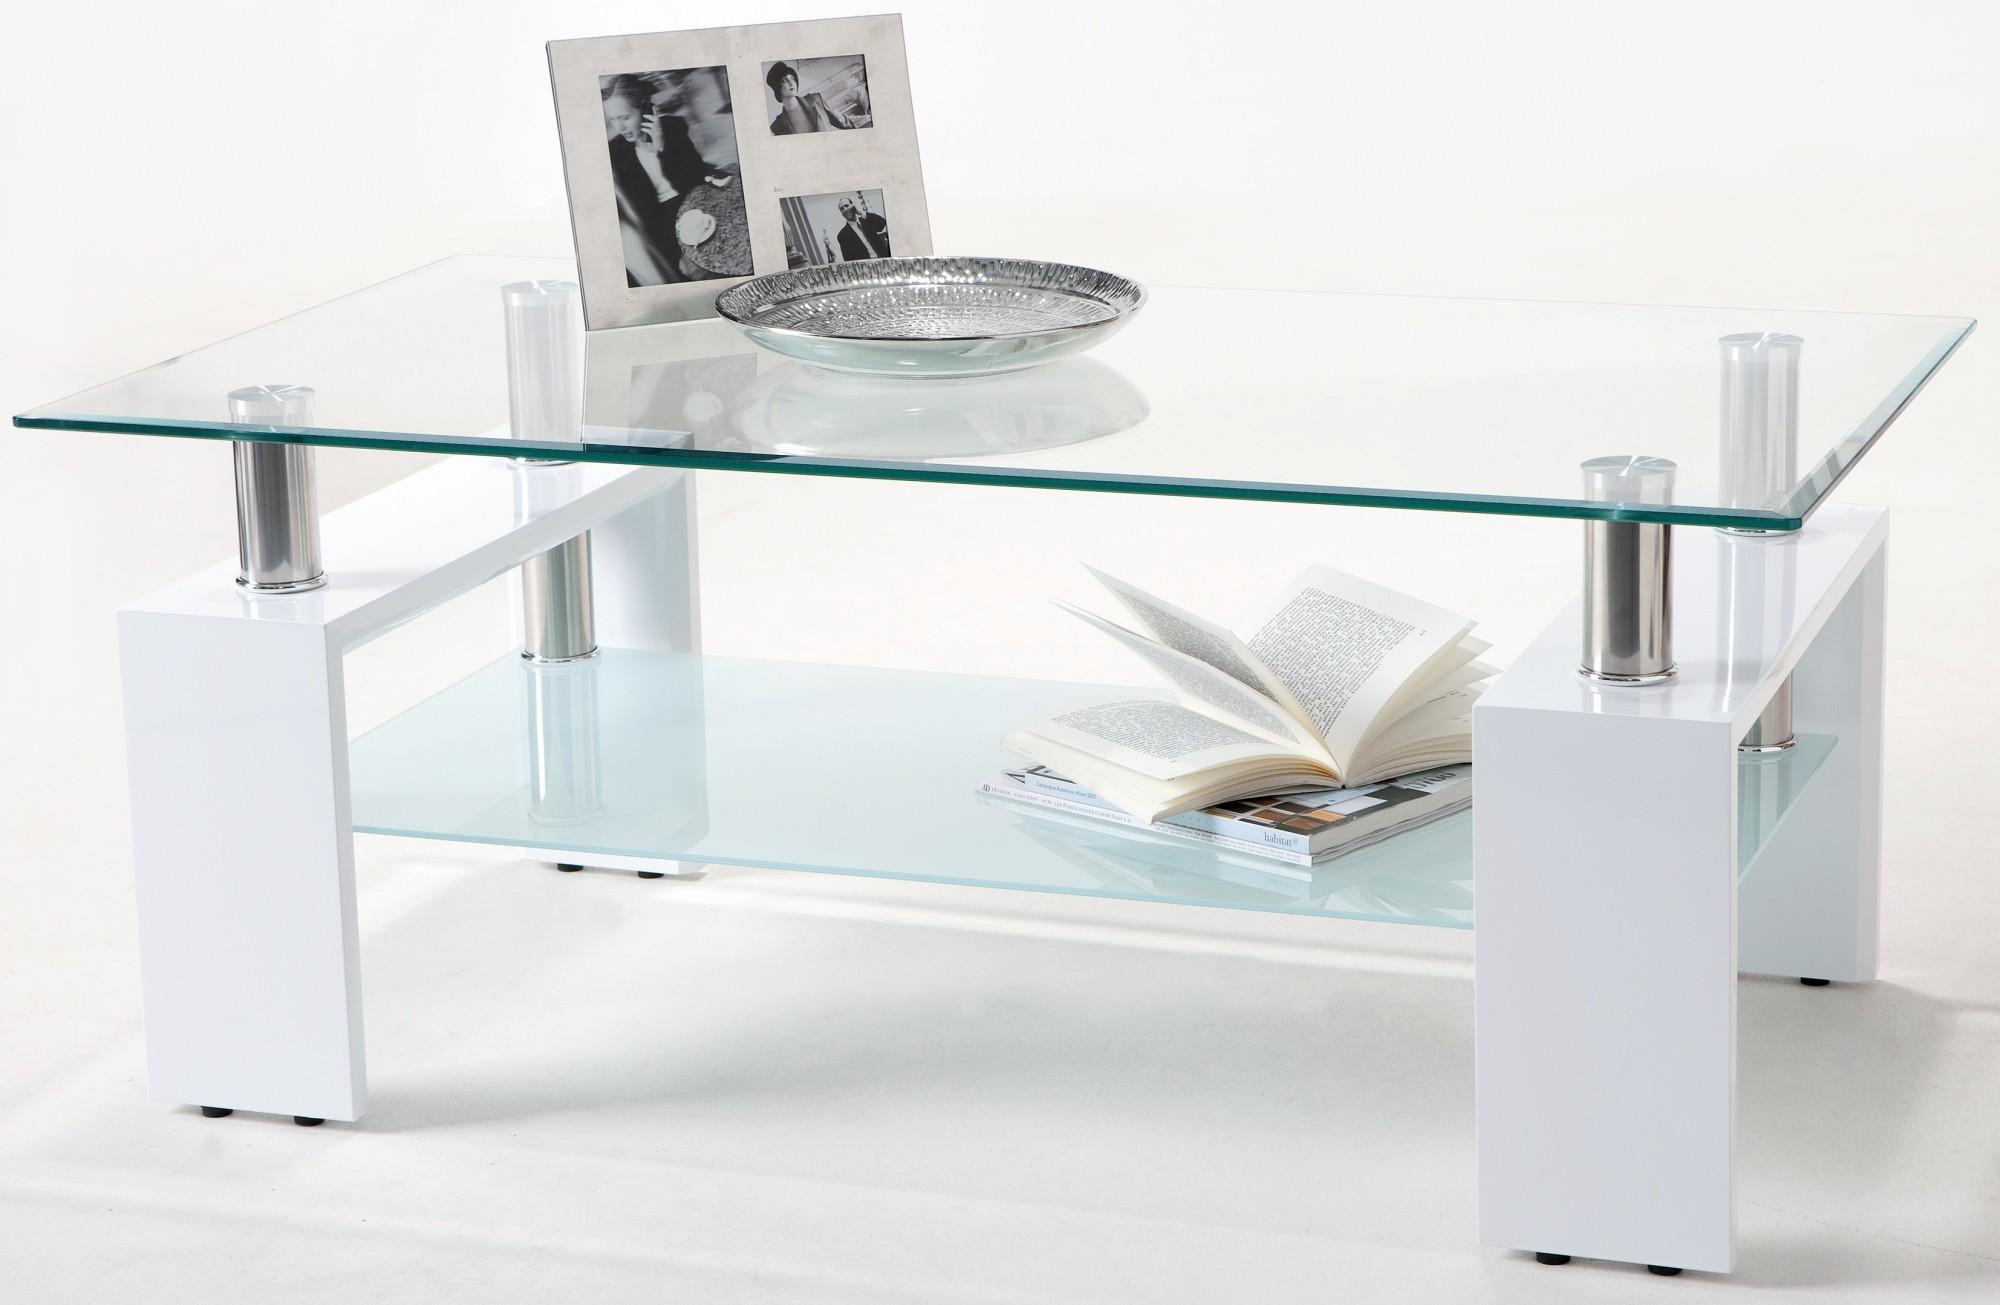 table basse laqu e blanche et verre tremp kari. Black Bedroom Furniture Sets. Home Design Ideas